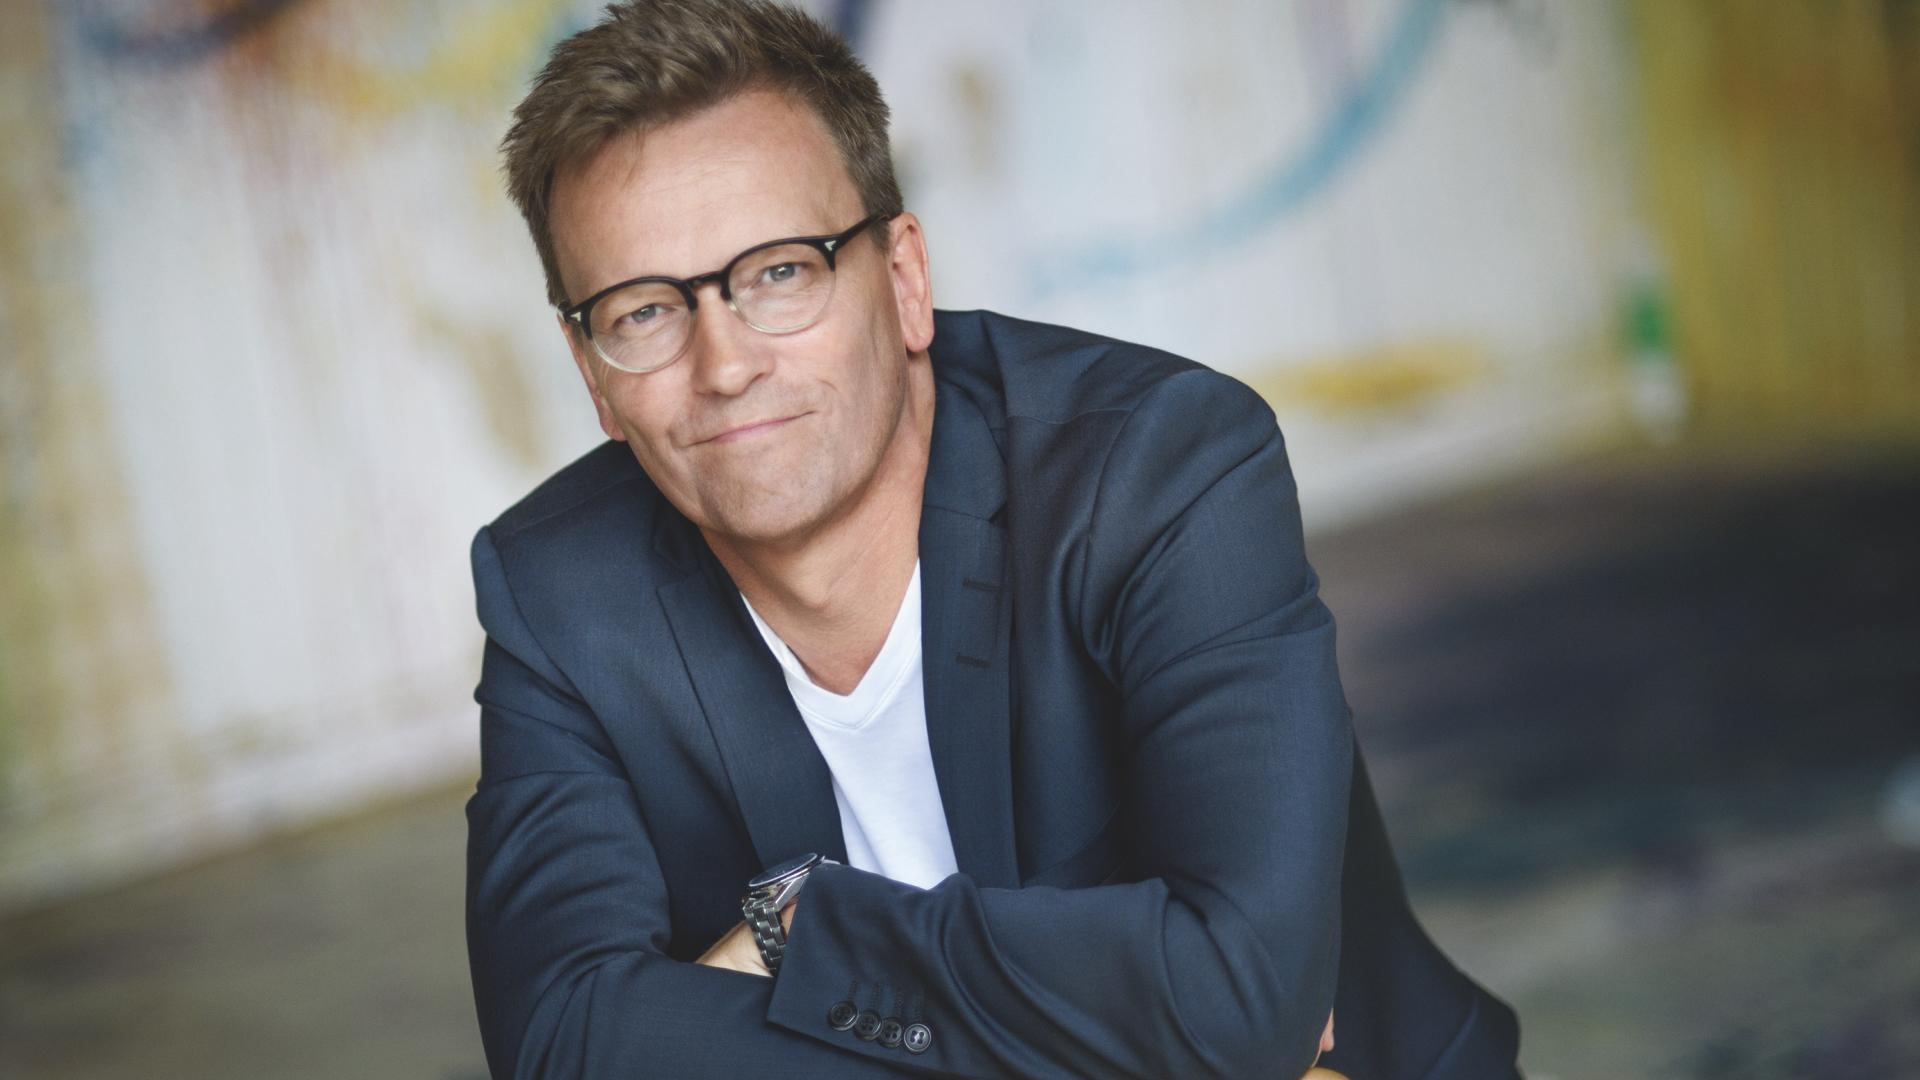 ORANGE COUNCIL Gründer Andreas Geyer